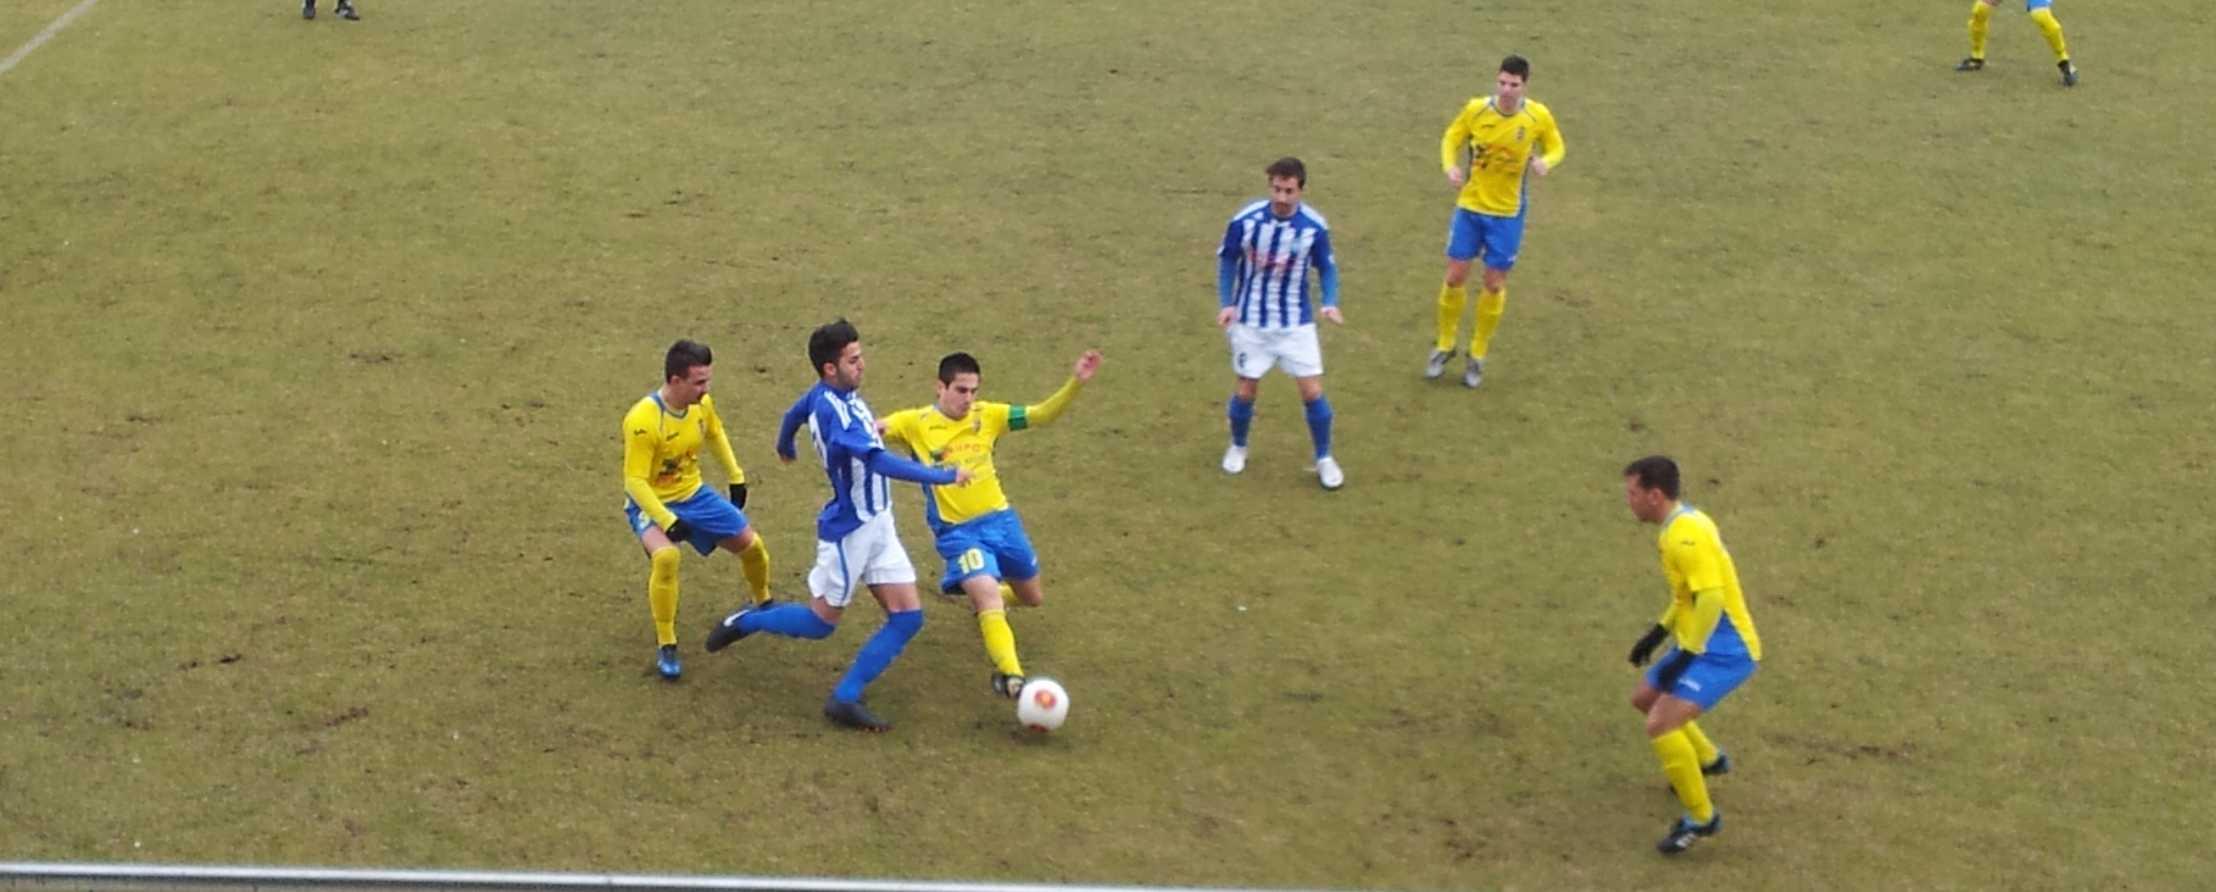 La Gineta CF - Villarrubia CF